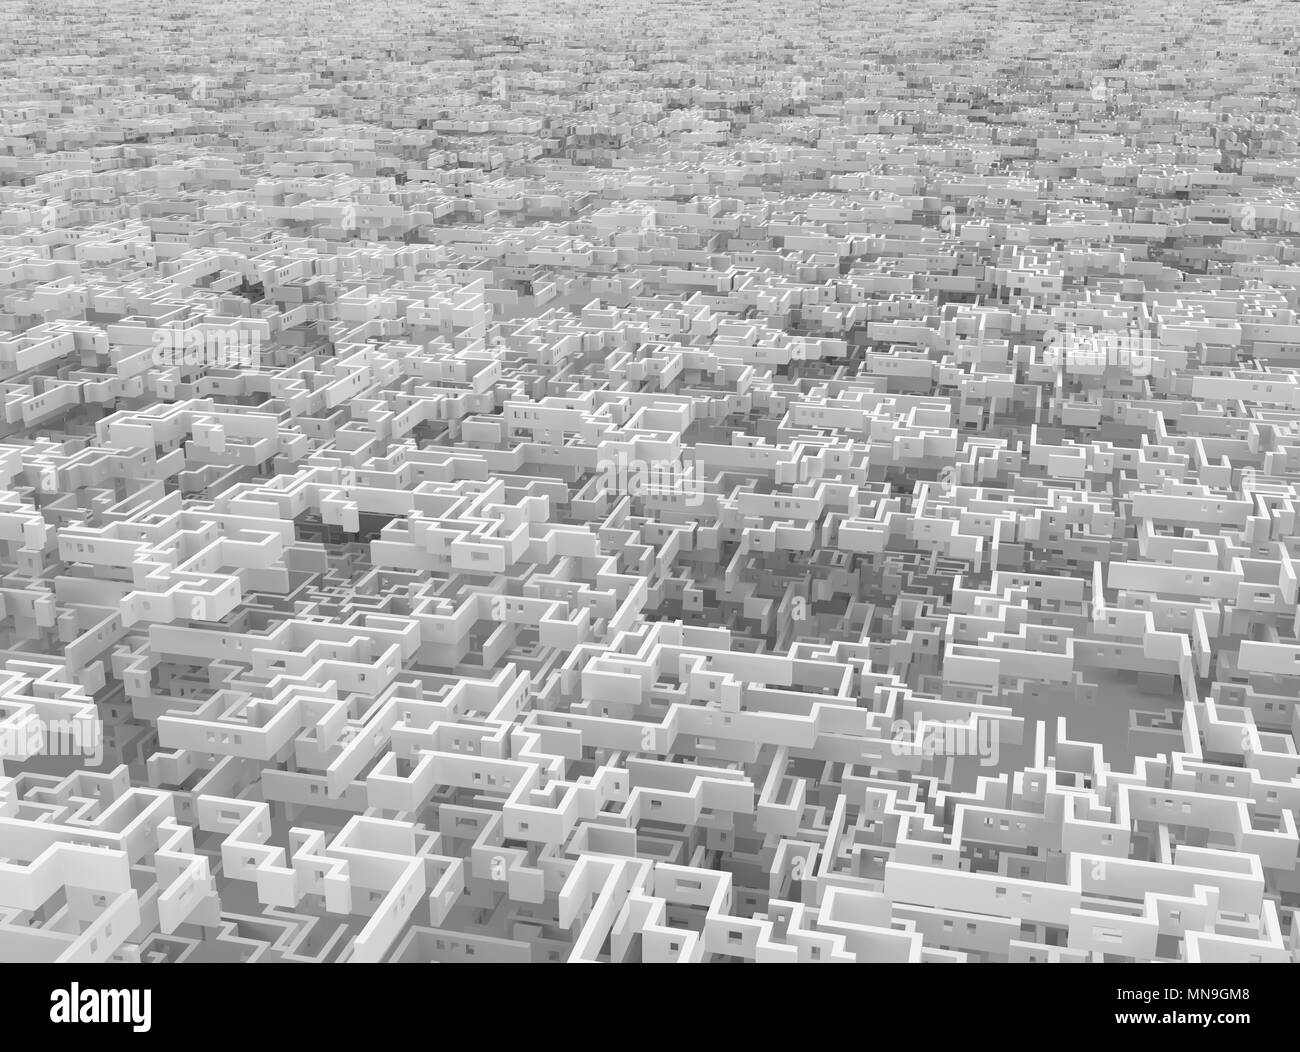 Weiße Wand Labyrinth endlos riesige Labyrinth surreal, 3D-Darstellung, horizontal Hintergrund Stockbild